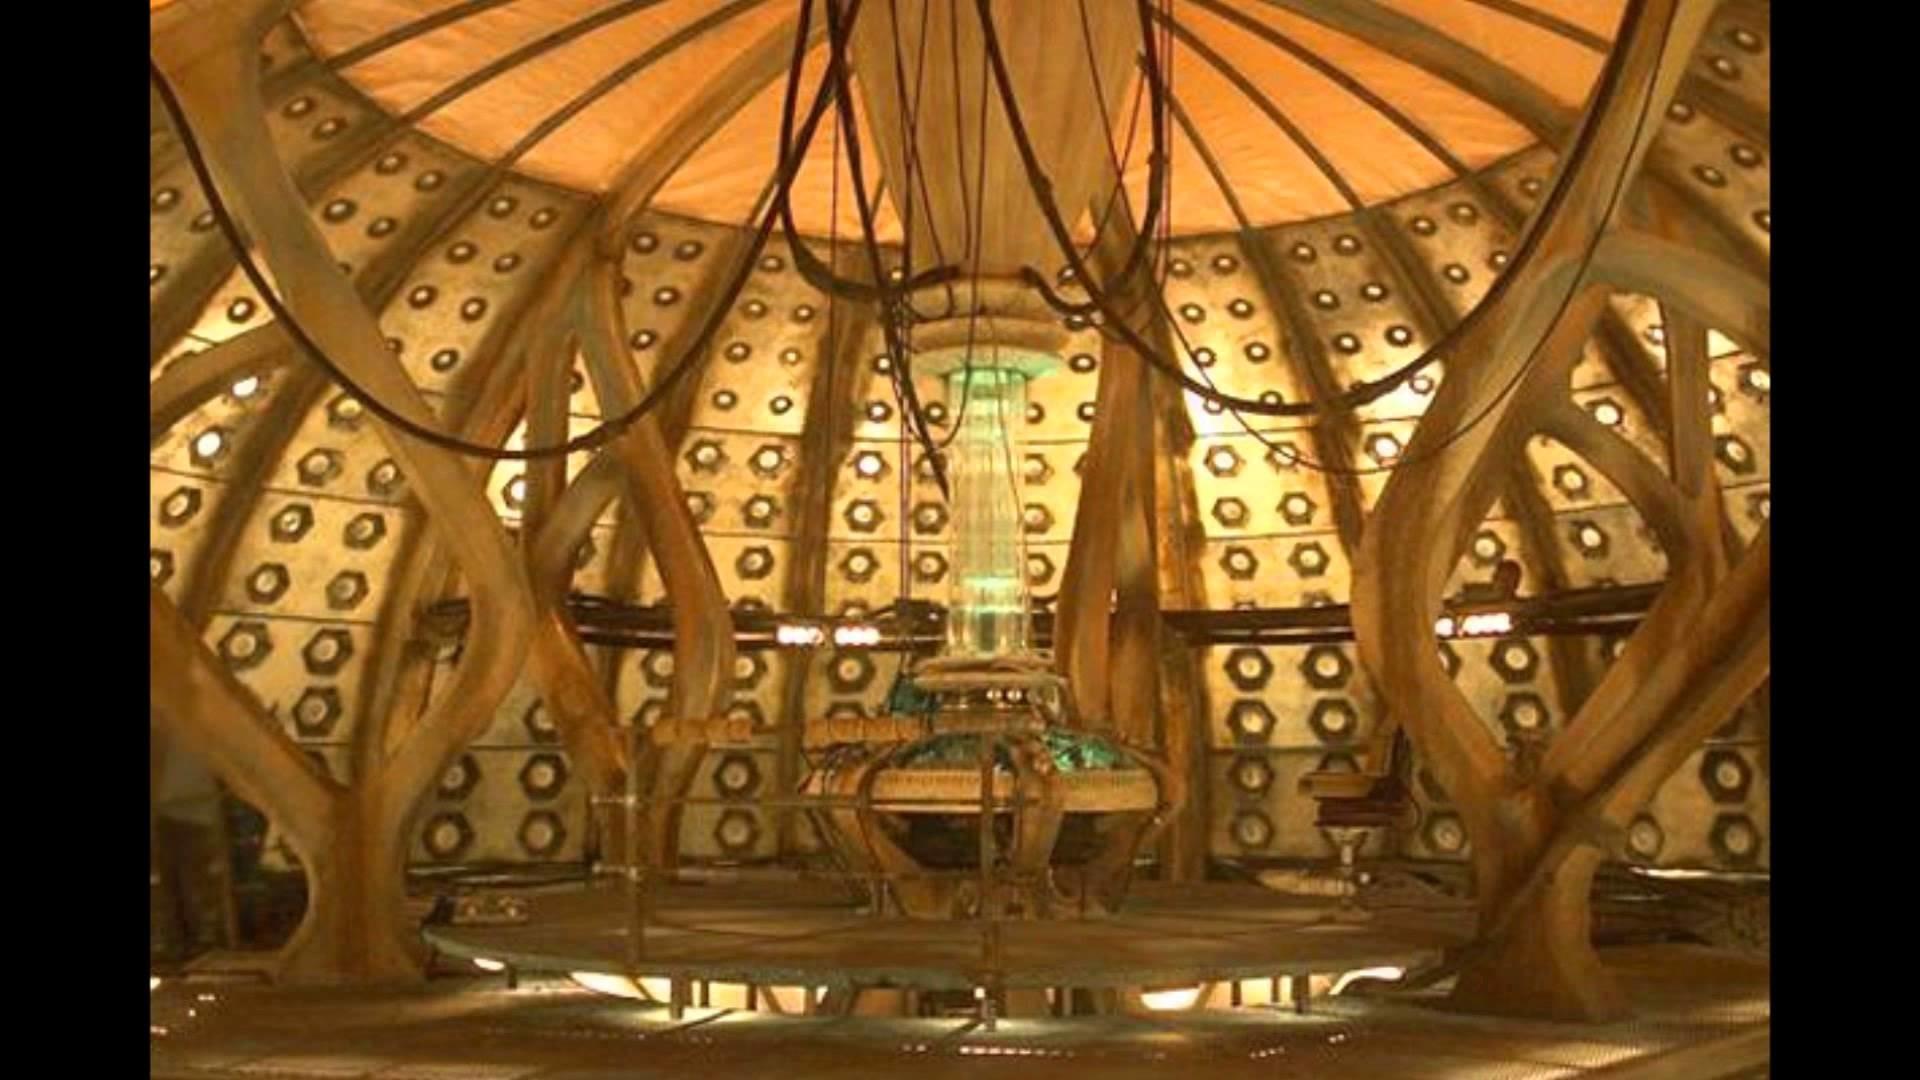 ТАРДИС взлёт, полёт, посадка 2005-2009 (TARDIS SFX 2005-2009) – YouTube